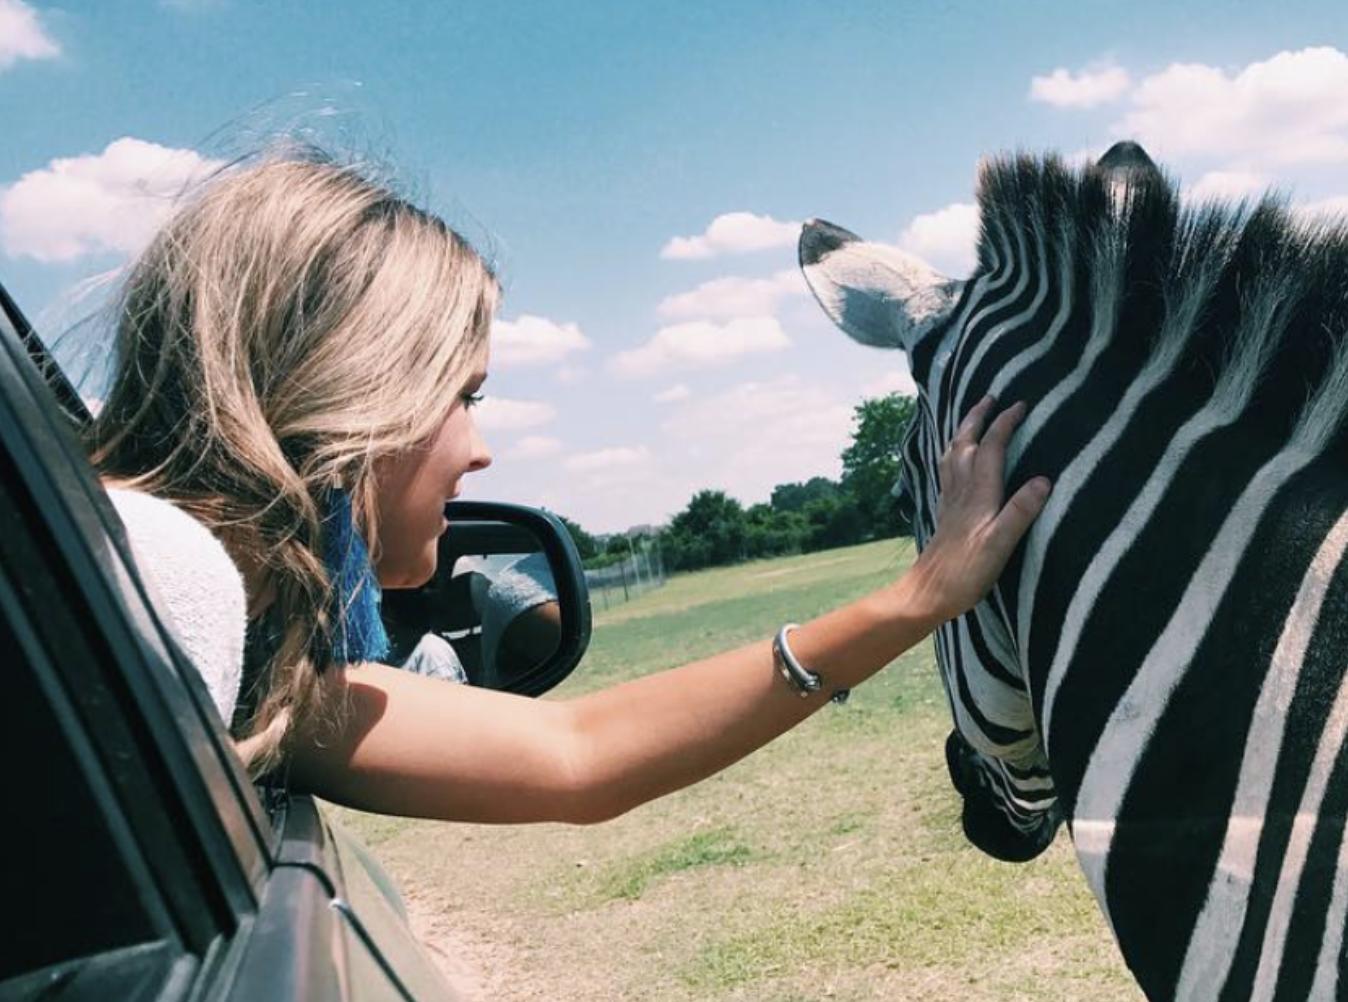 Girl in car petting zebra through open window